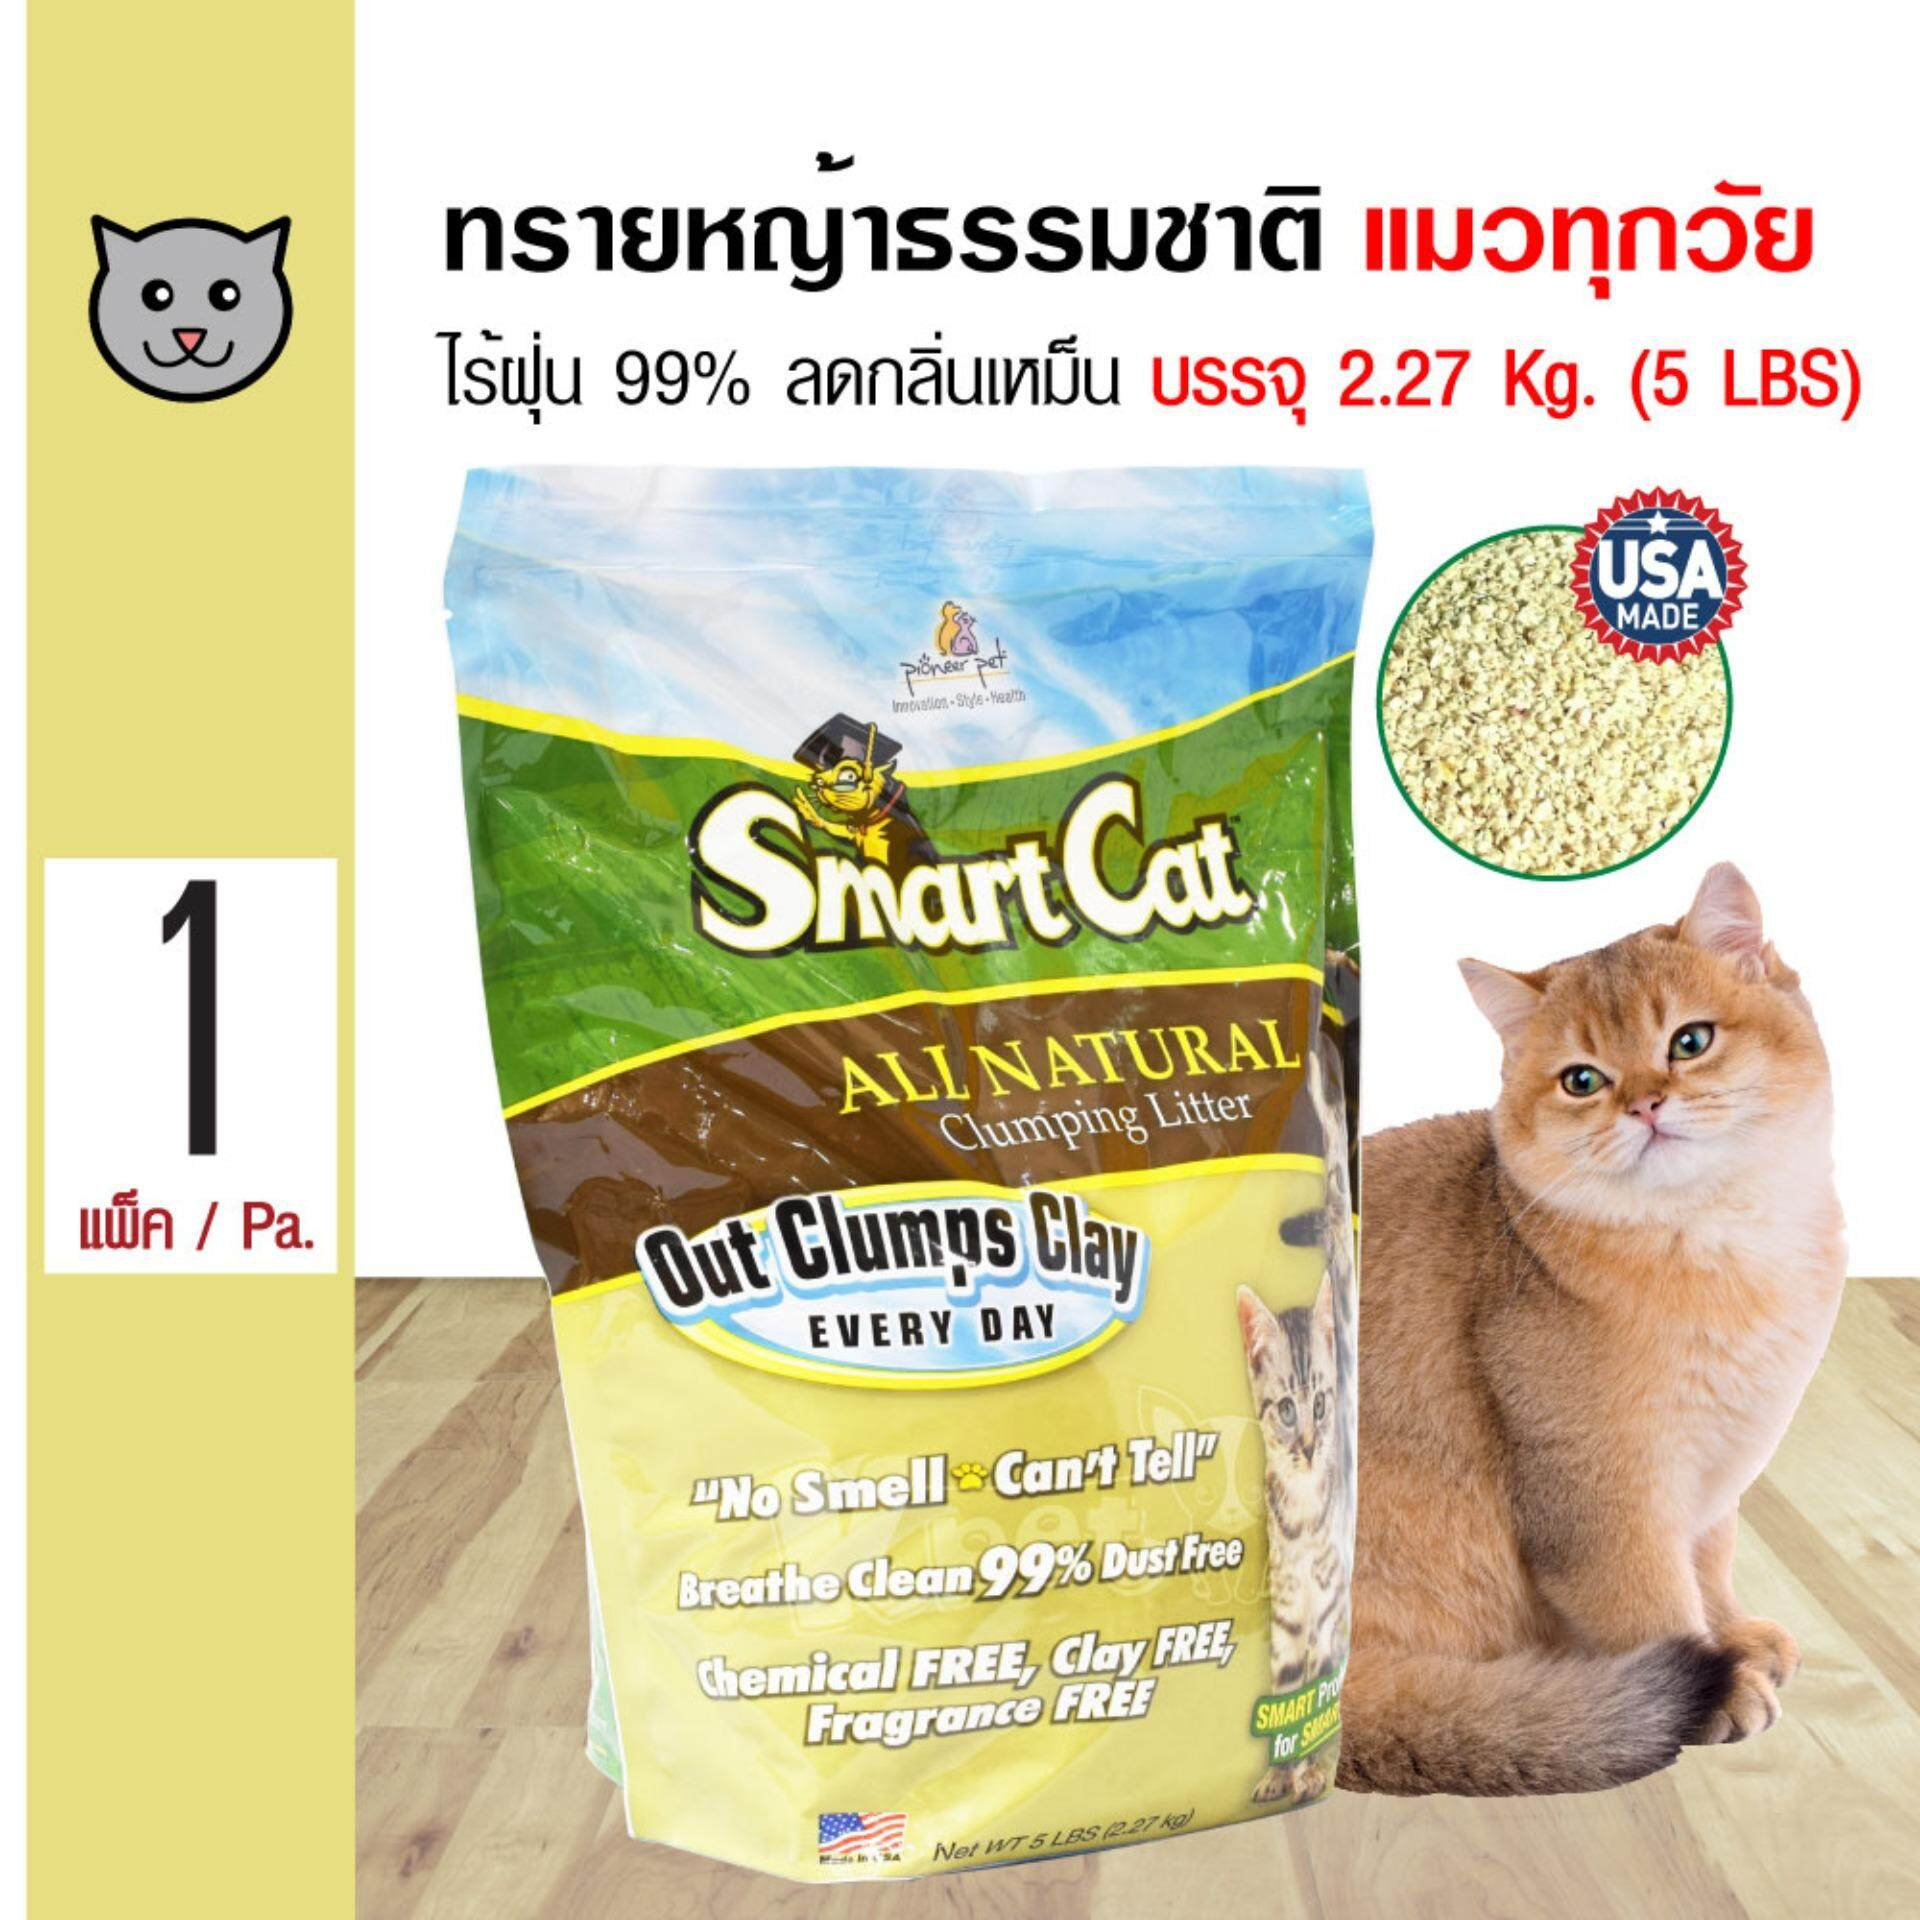 Smartcat ทรายแมว ทรายหญ้าธรรมชาติ 100% ปลอดภัย ไร้ฝุ่น ไร้กลิ่น จับตัวเป็นก้อน บรรจุ 2.27 กิโลกรัม (5 Lbs).